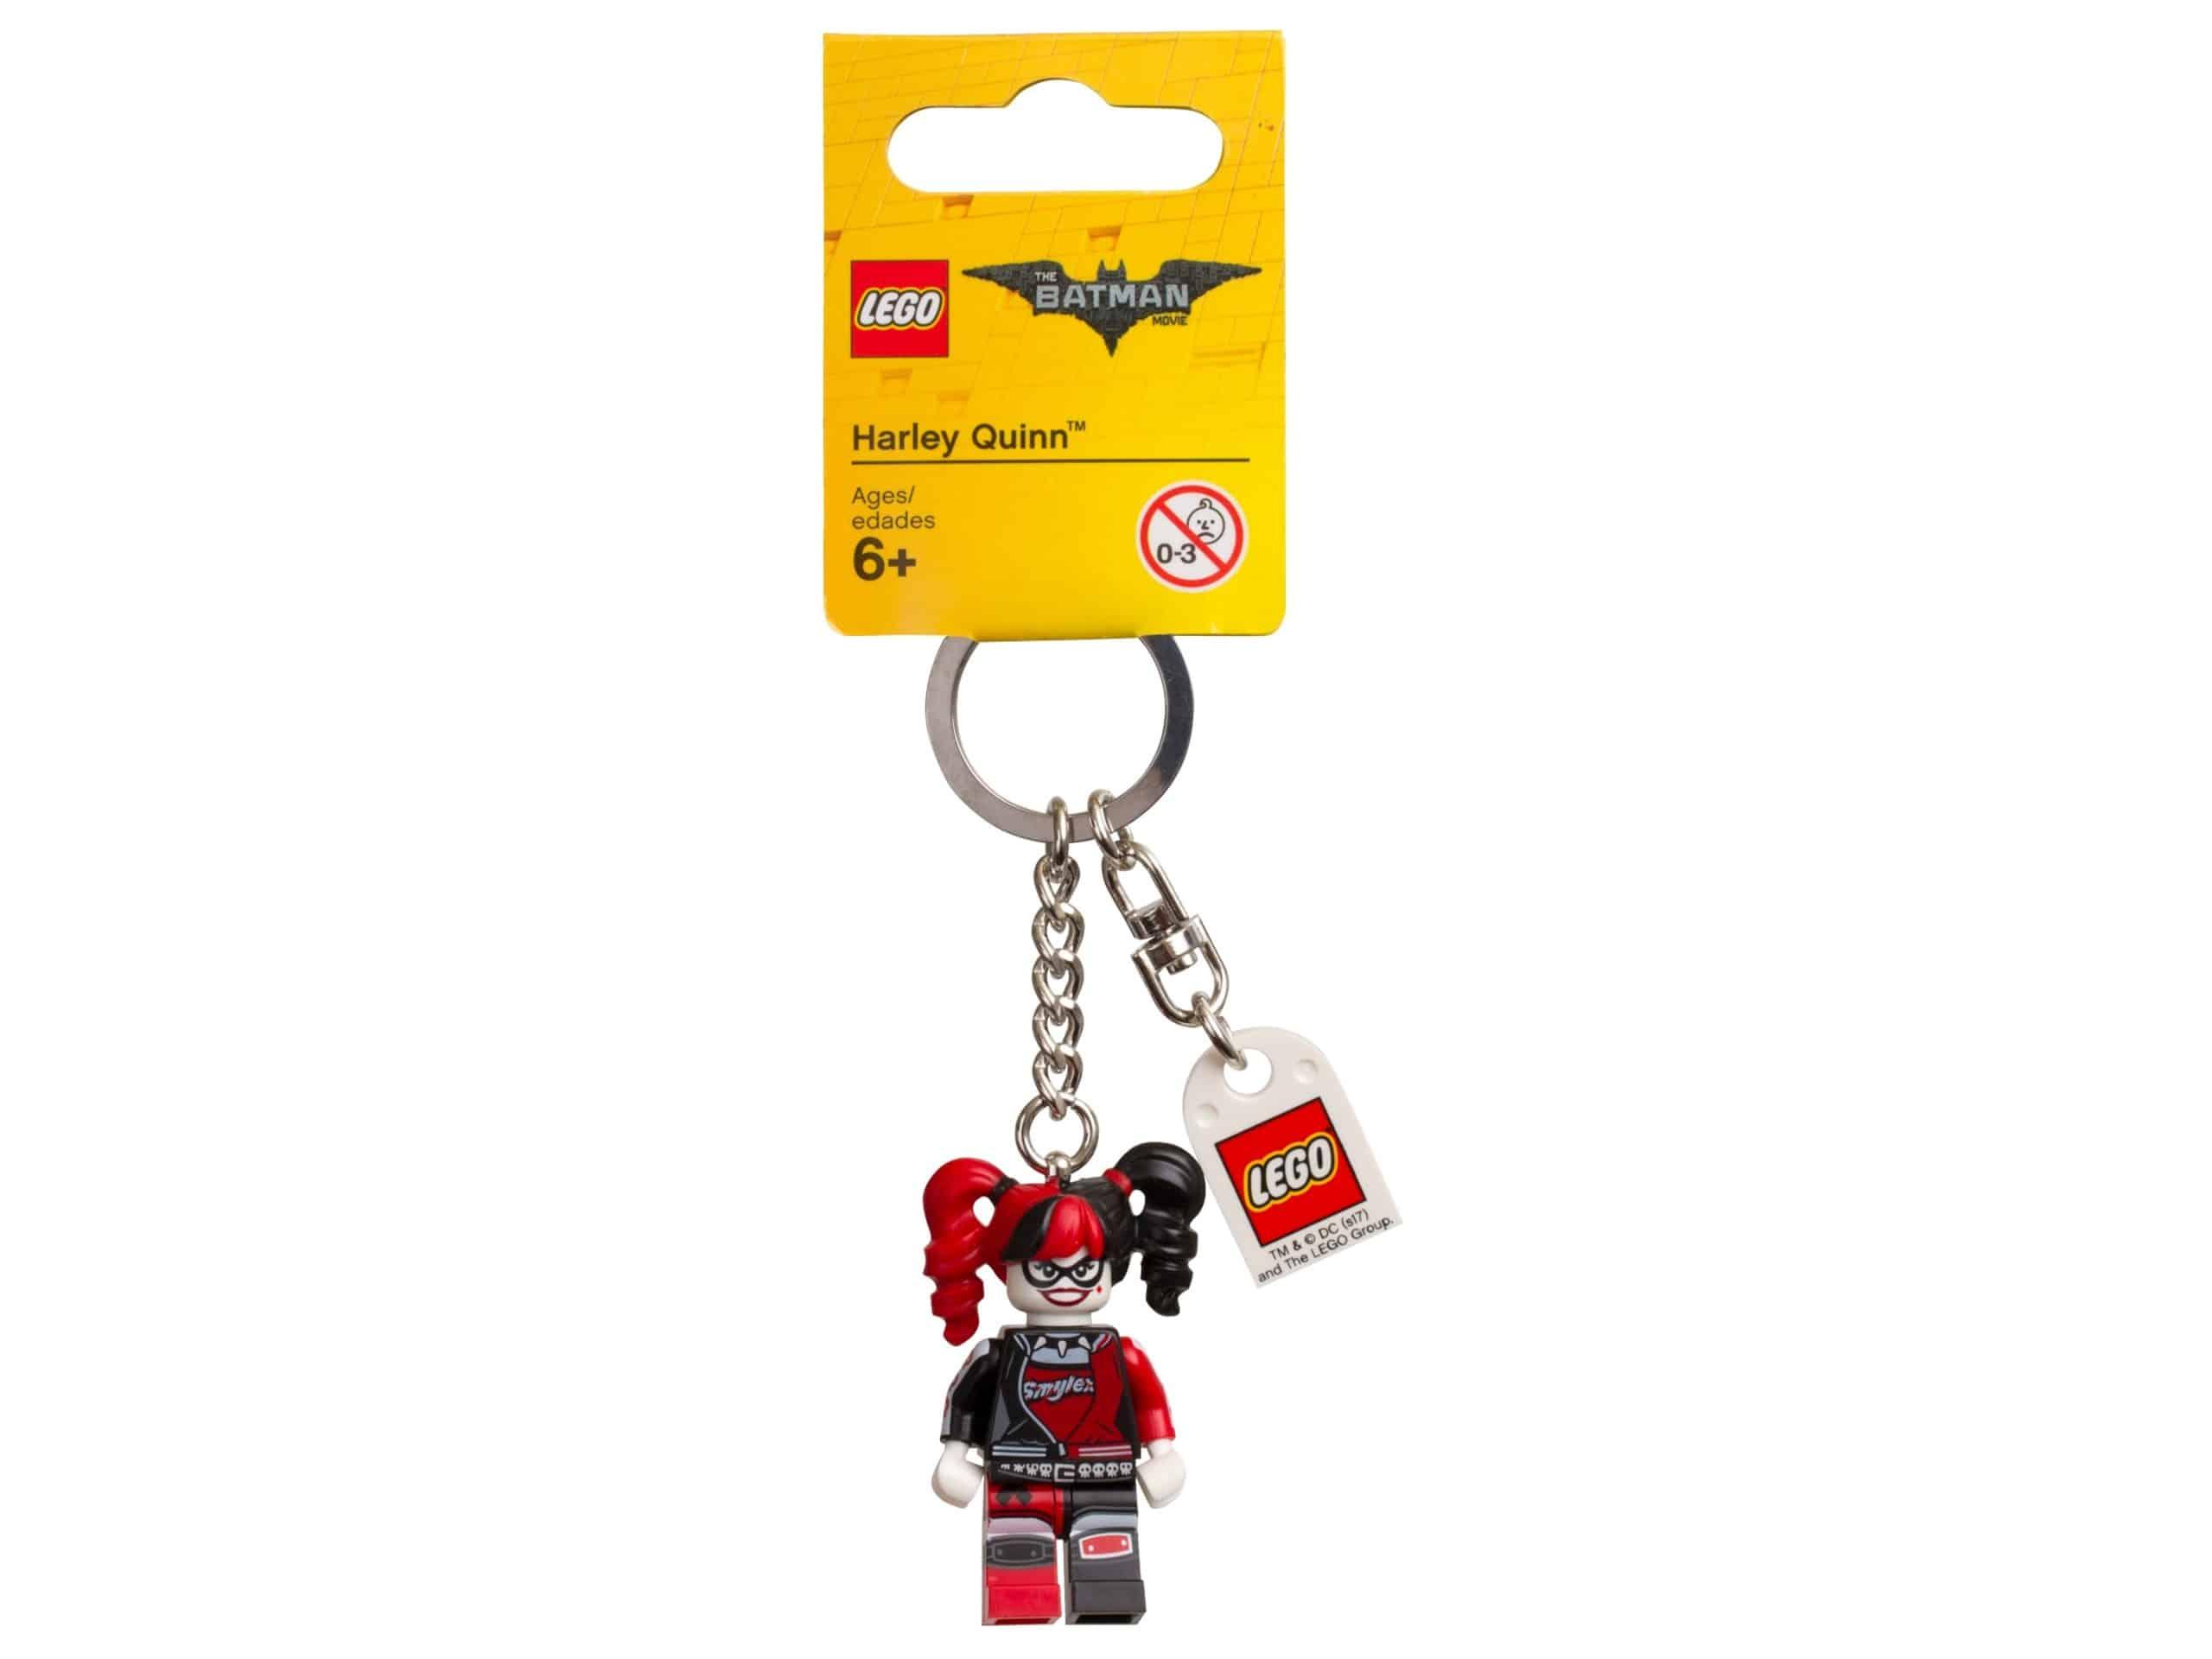 lego 853636 nyckelring harley quinn scaled